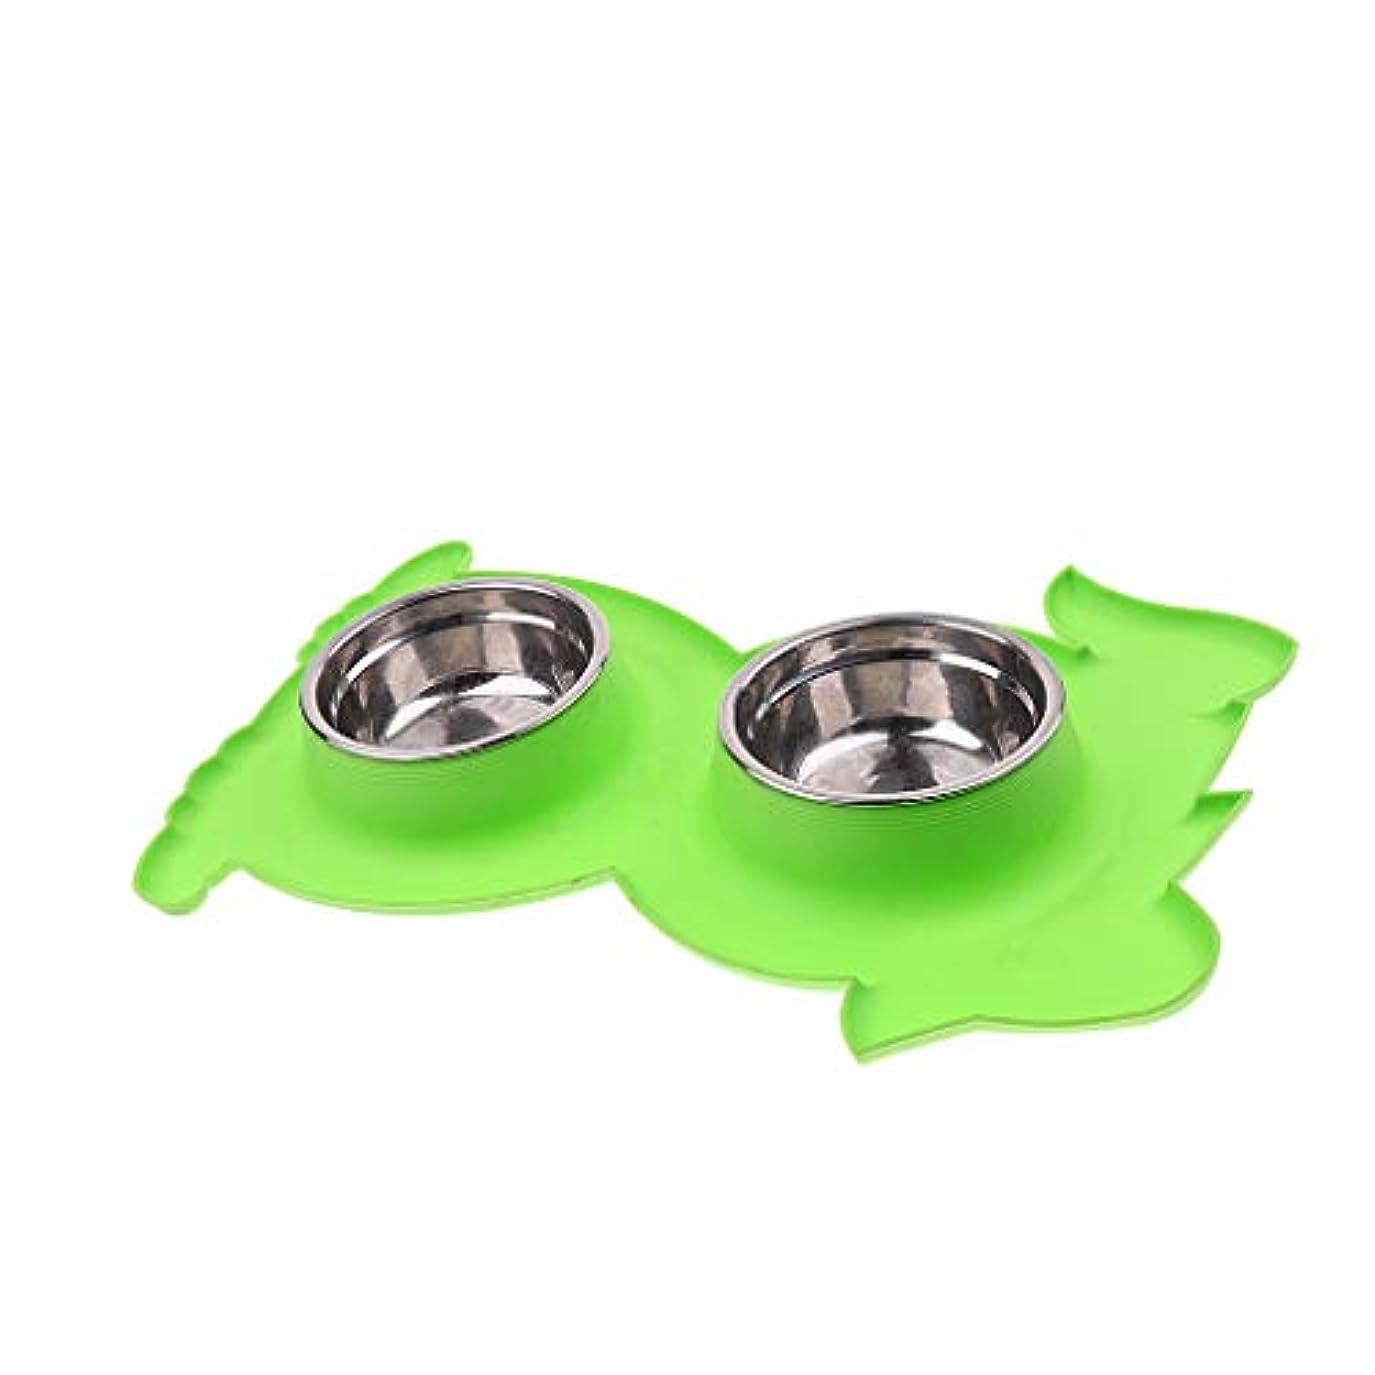 Perfeclan 犬 猫 食品 給水 装置 ボウル 滑り止め 持ち運び便利 3色選べる - 緑